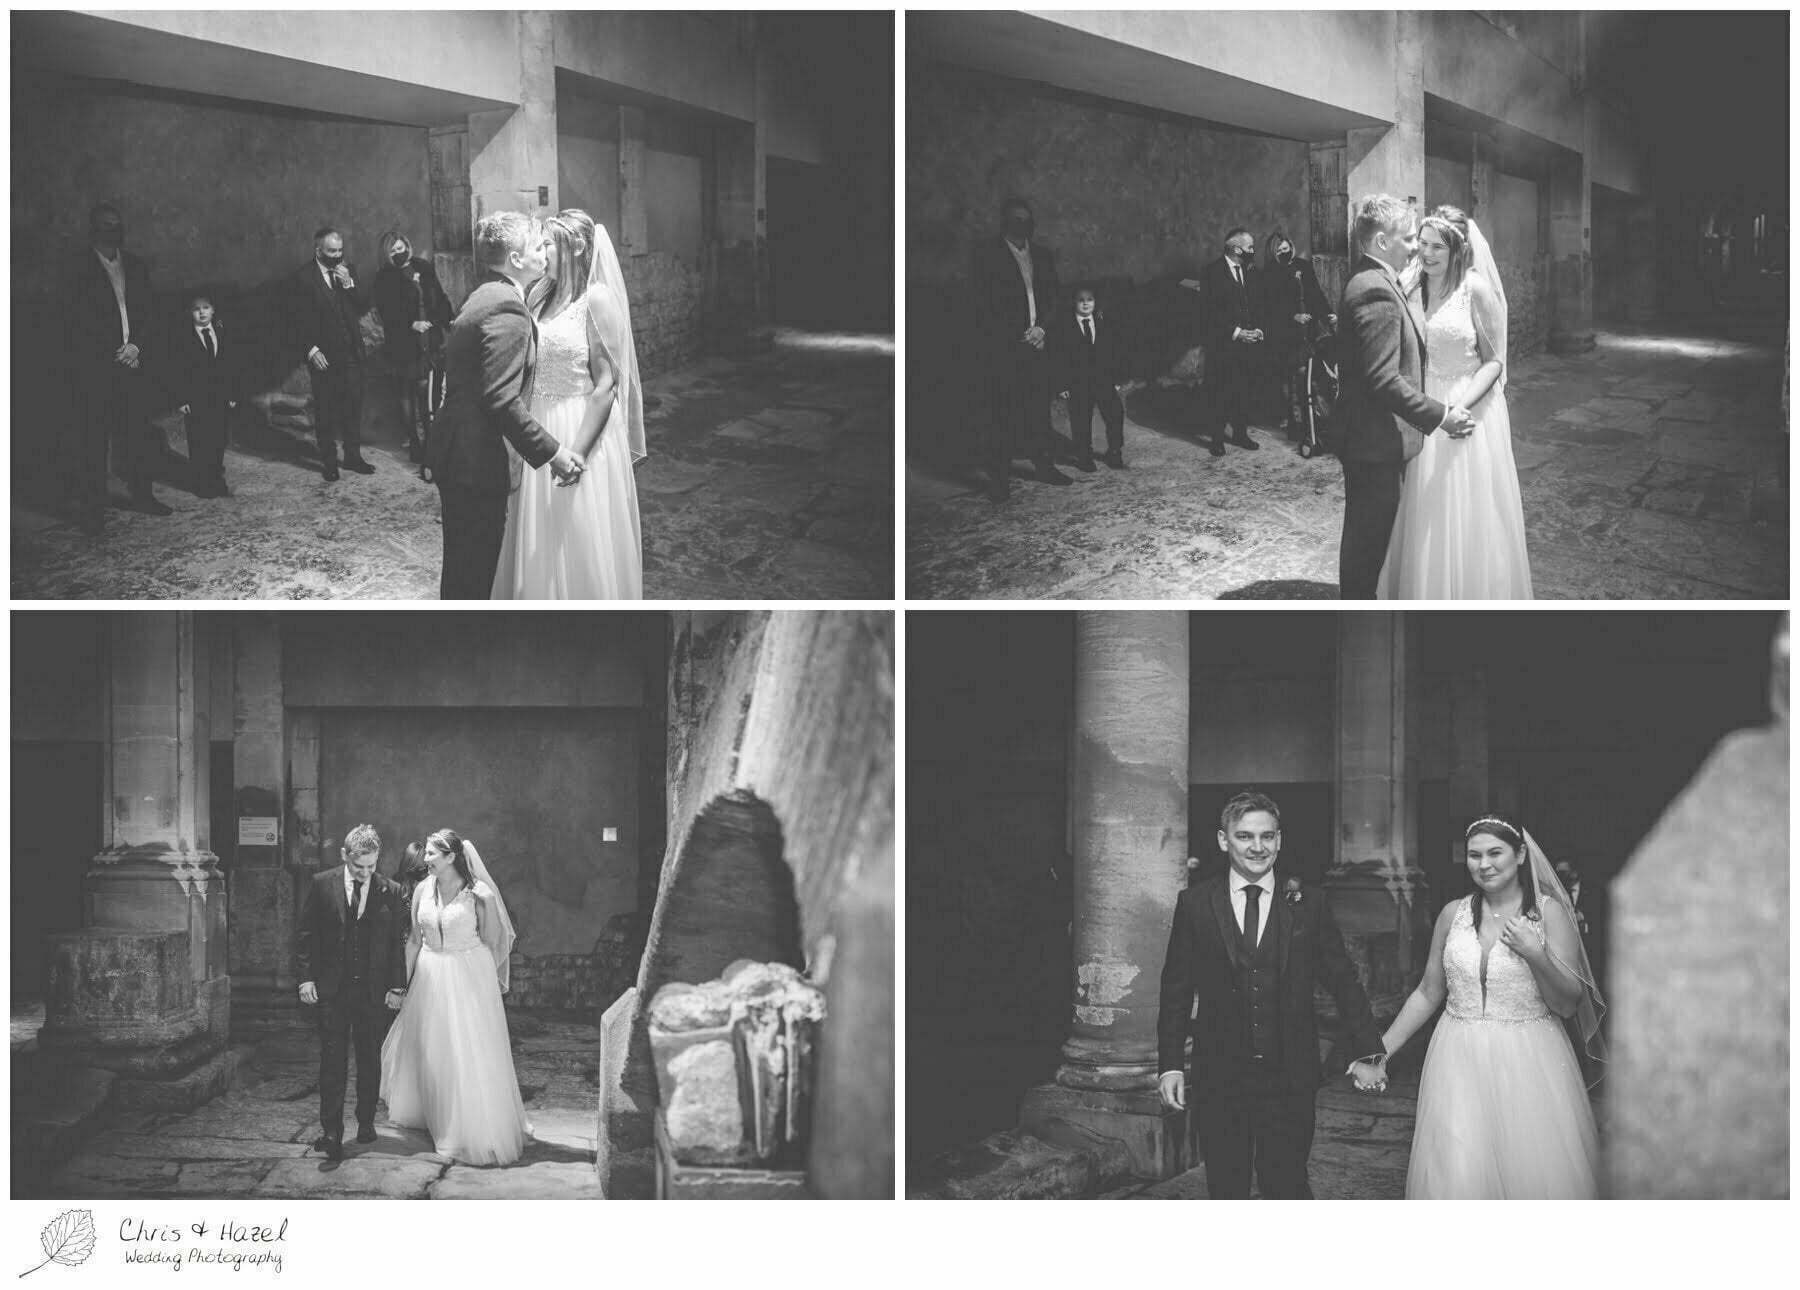 Bride and Groom Wedding Ceremony at Roman Baths Pump Rooms, The Roman Baths Wedding Photography, Roman Baths Wedding Photographer, Wedding in Bath, Bath Wedding Day, documentary wedding photography, Chris and Hazel Wedding Photography Bath, Sammie Singfield Scott Brown